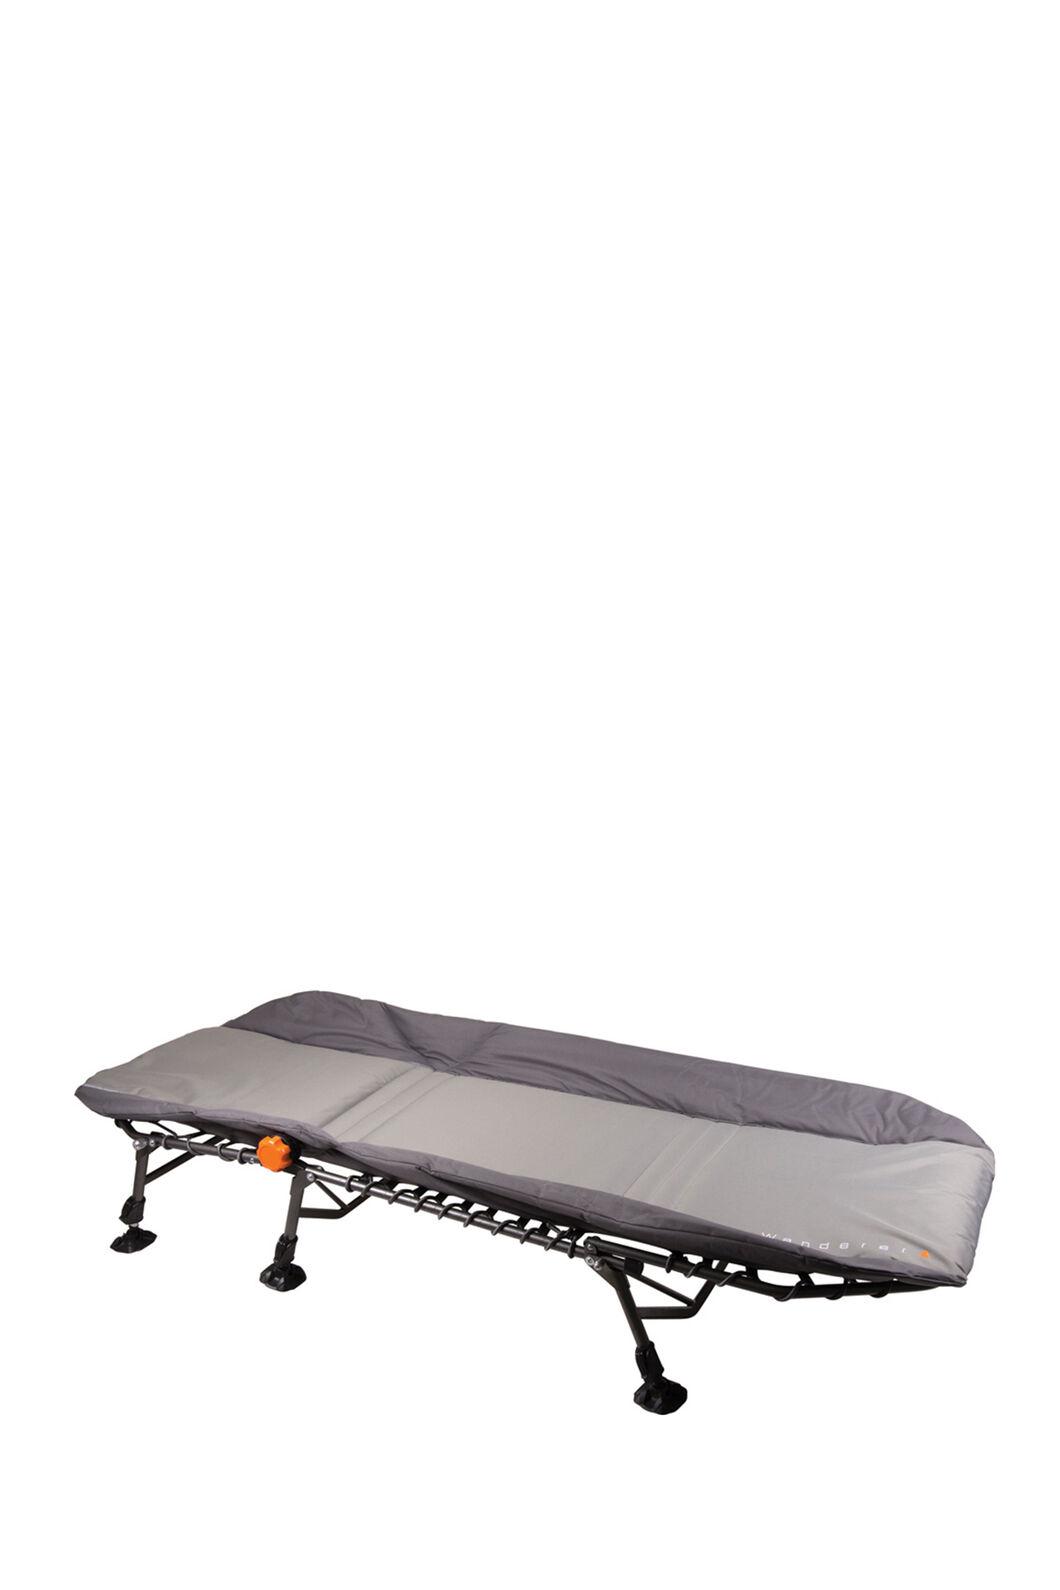 Wanderer Premium Ultra Comfort Folding Stretcher, None, hi-res